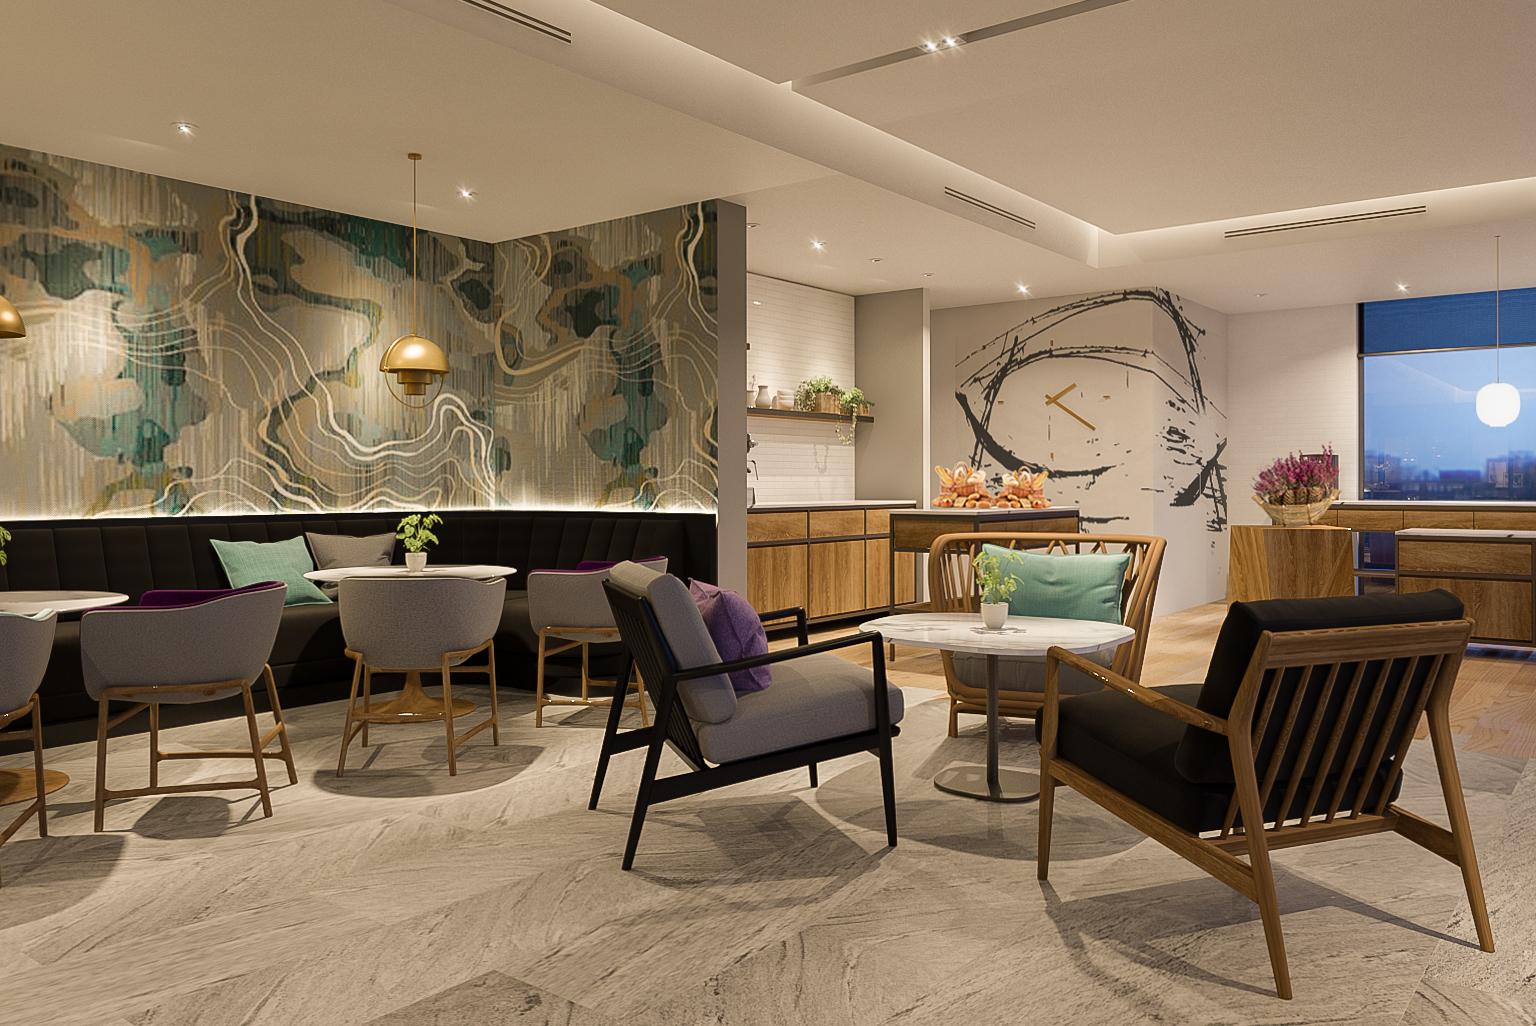 Anya Premier Quy Nhơn Executive Lounge